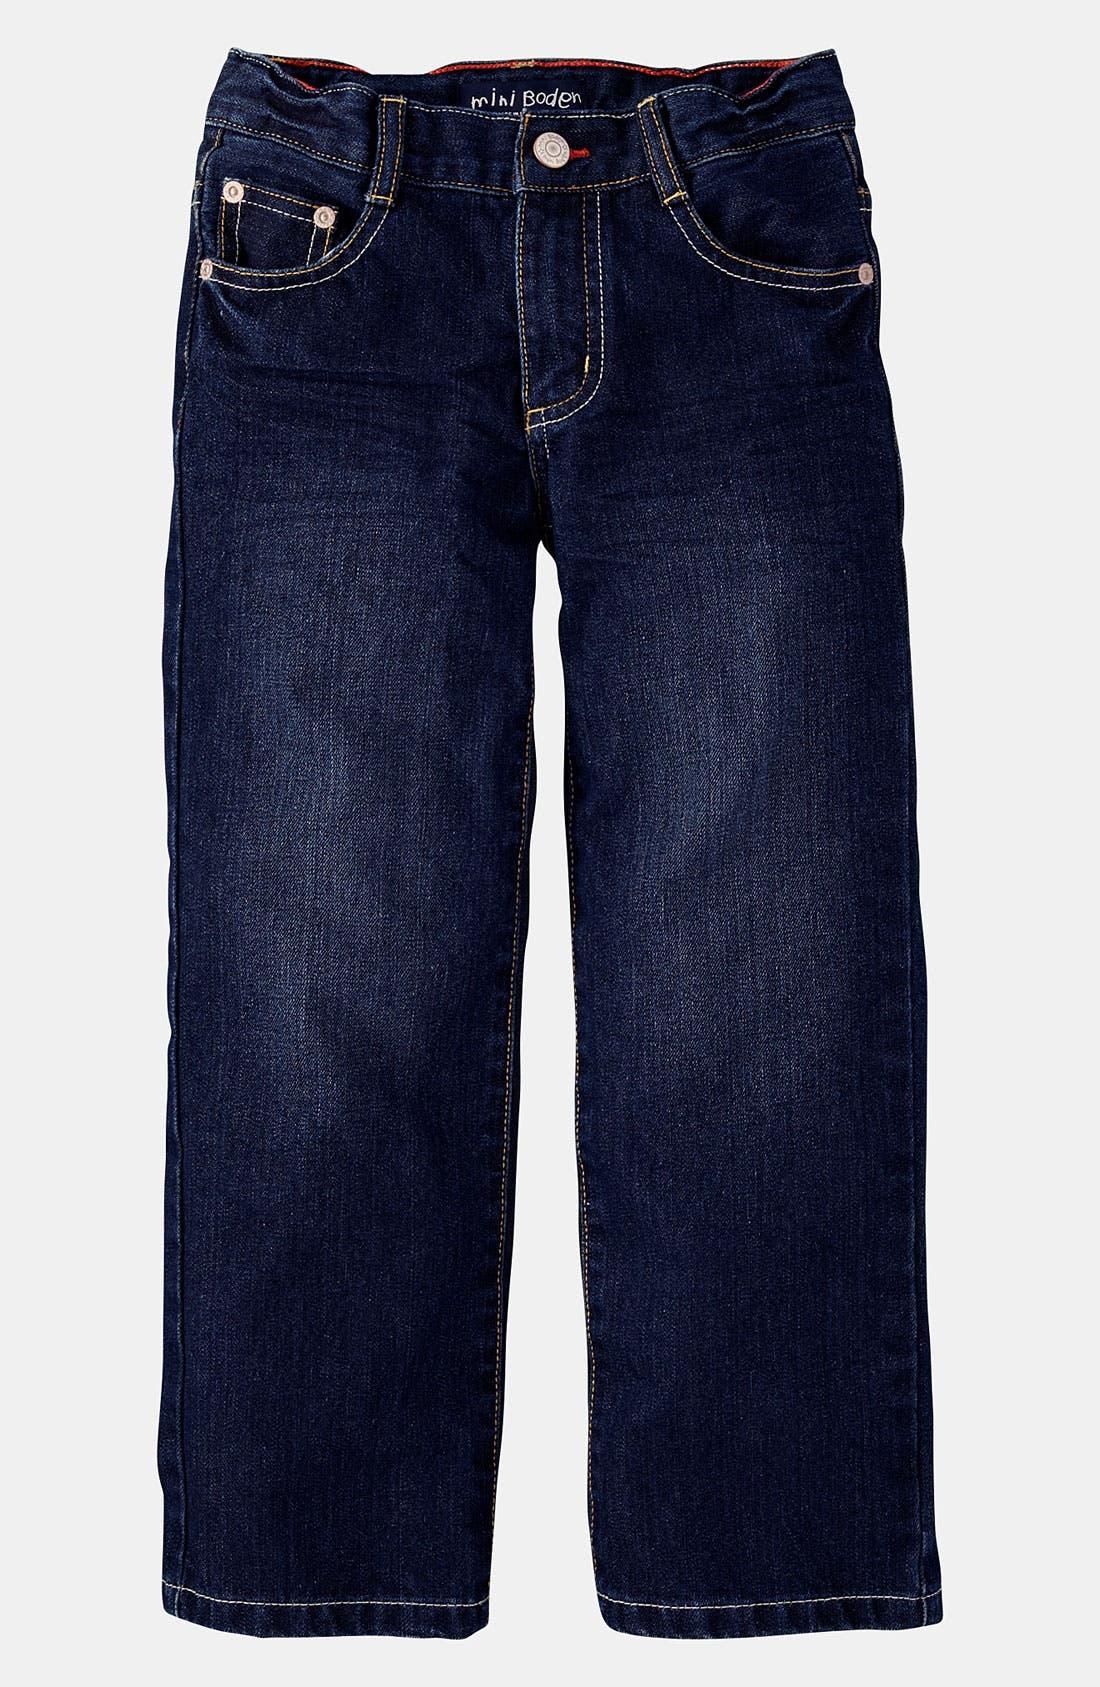 Main Image - Mini Boden Regular Fit Jeans (Little Boys & Big Boys)